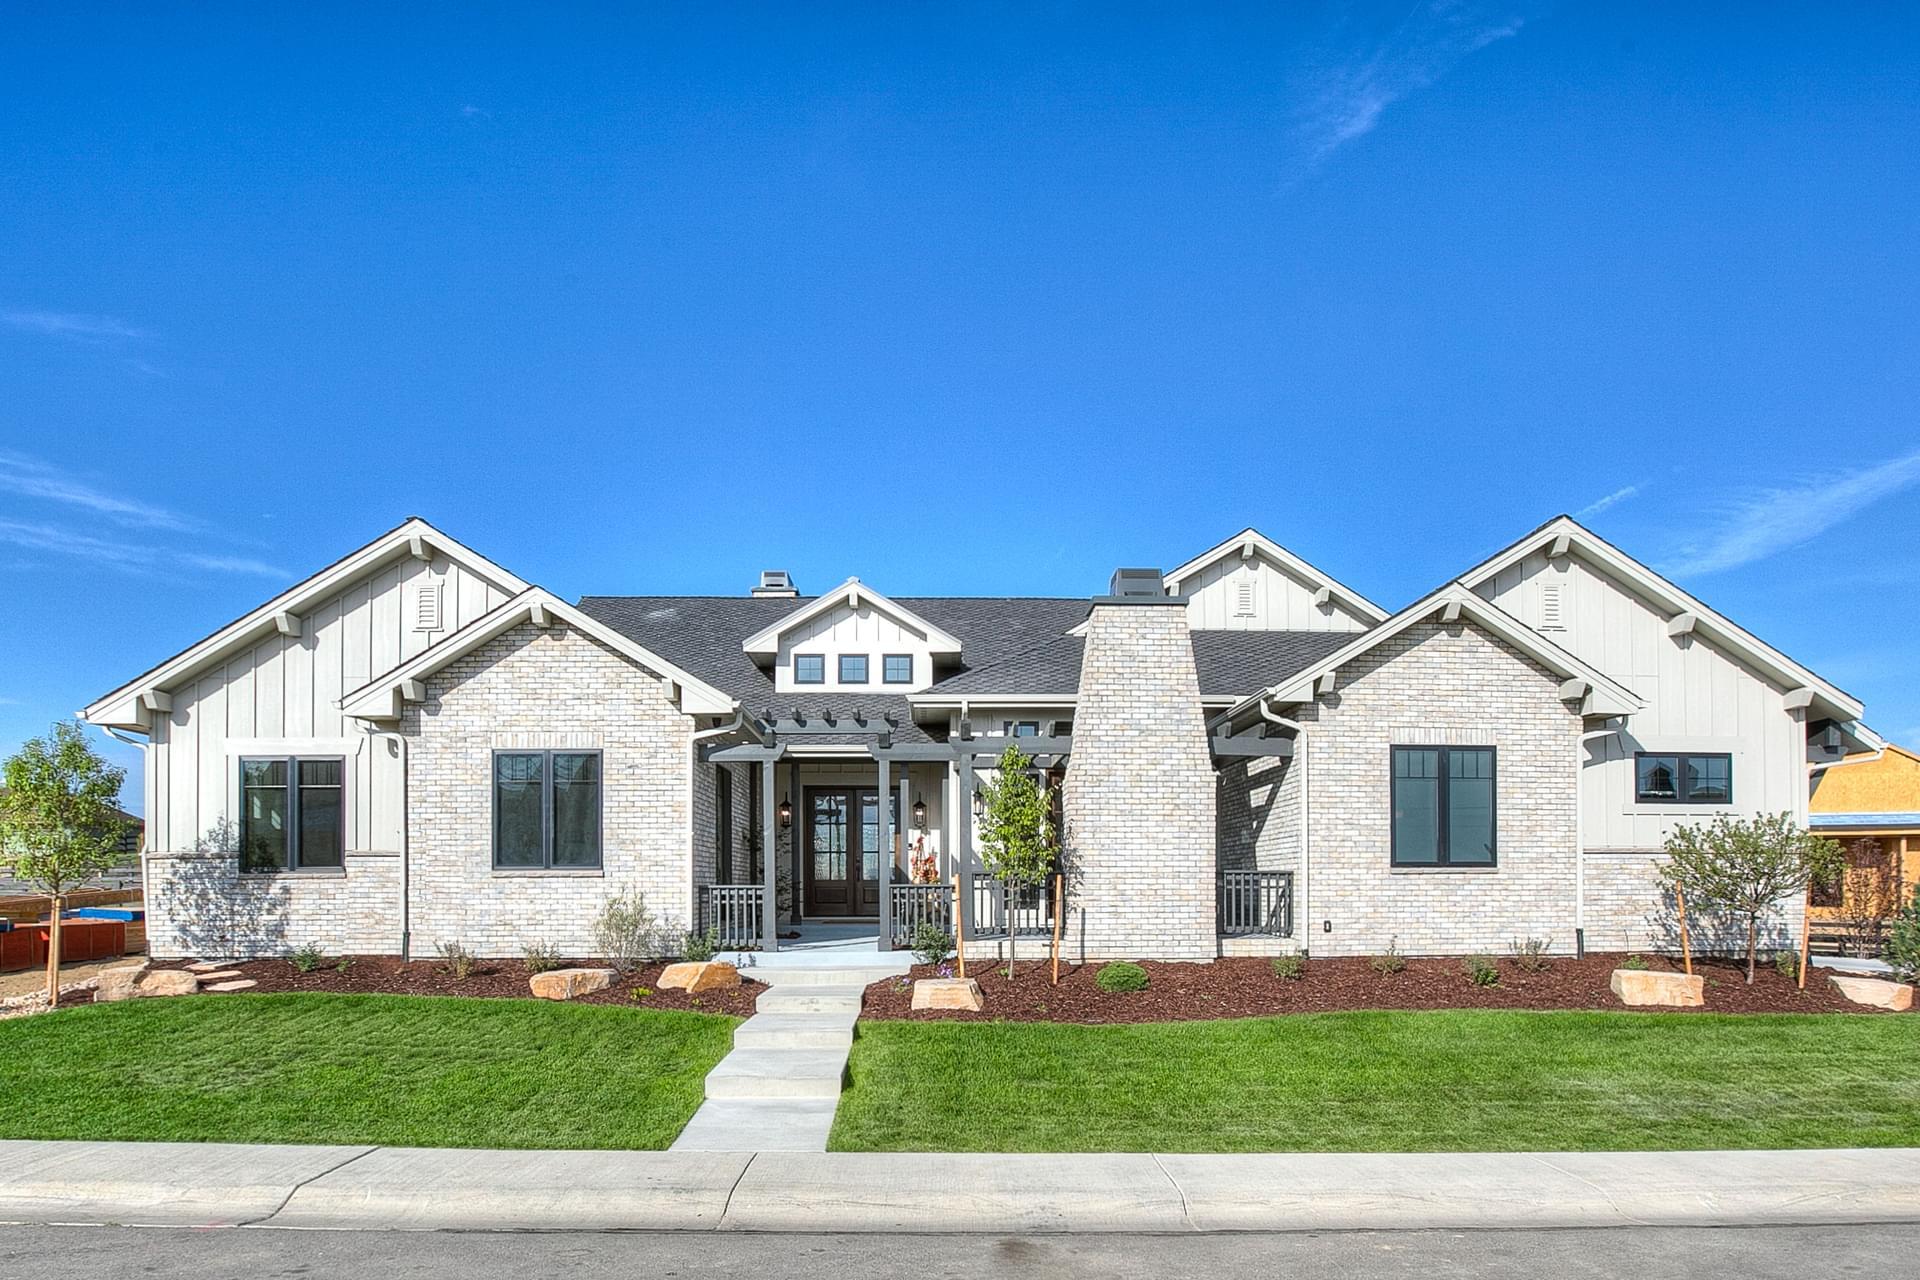 Estate Semi-Custom Homes New Homes in Semi-Custom Estate Homes, CO